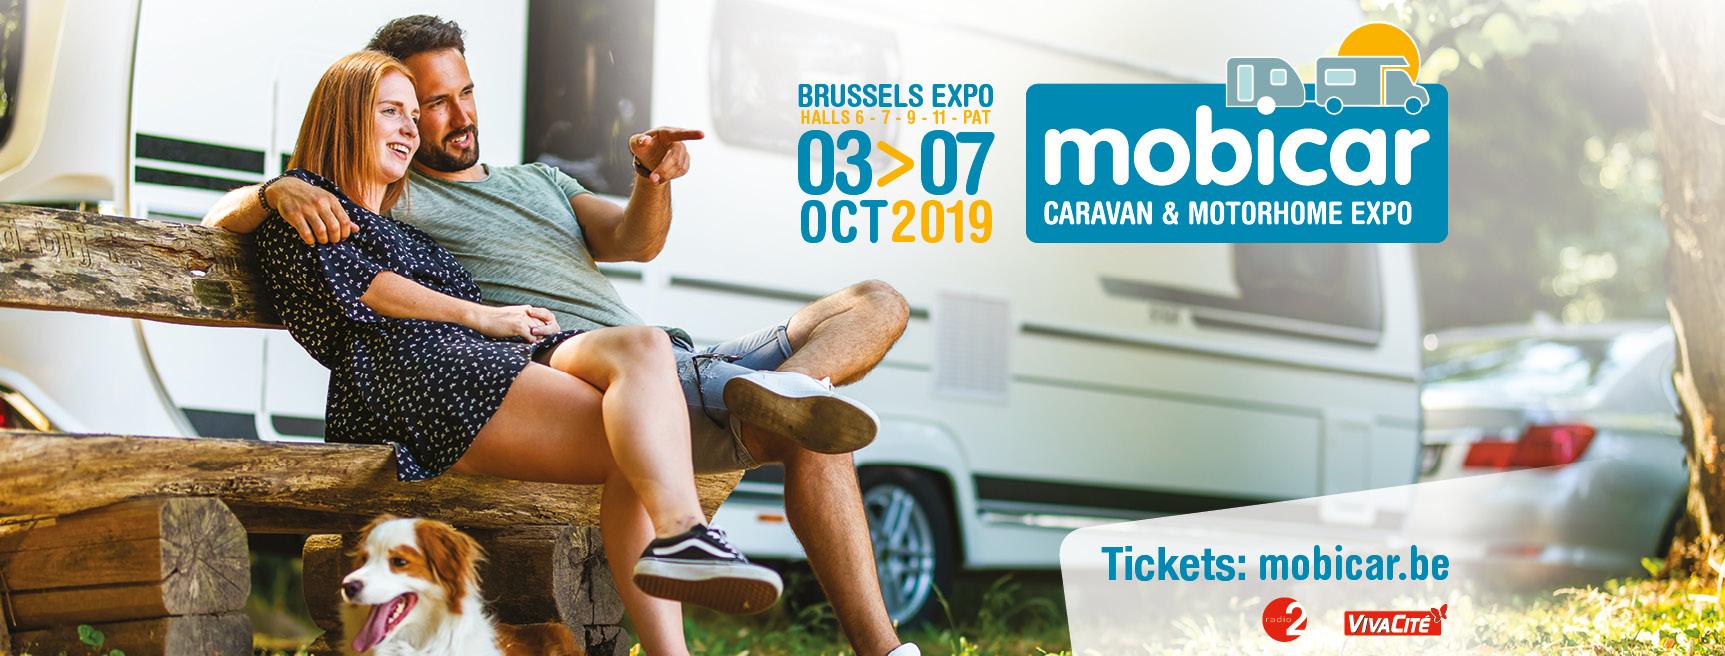 Mobicar Caravan & Motorhome Expo